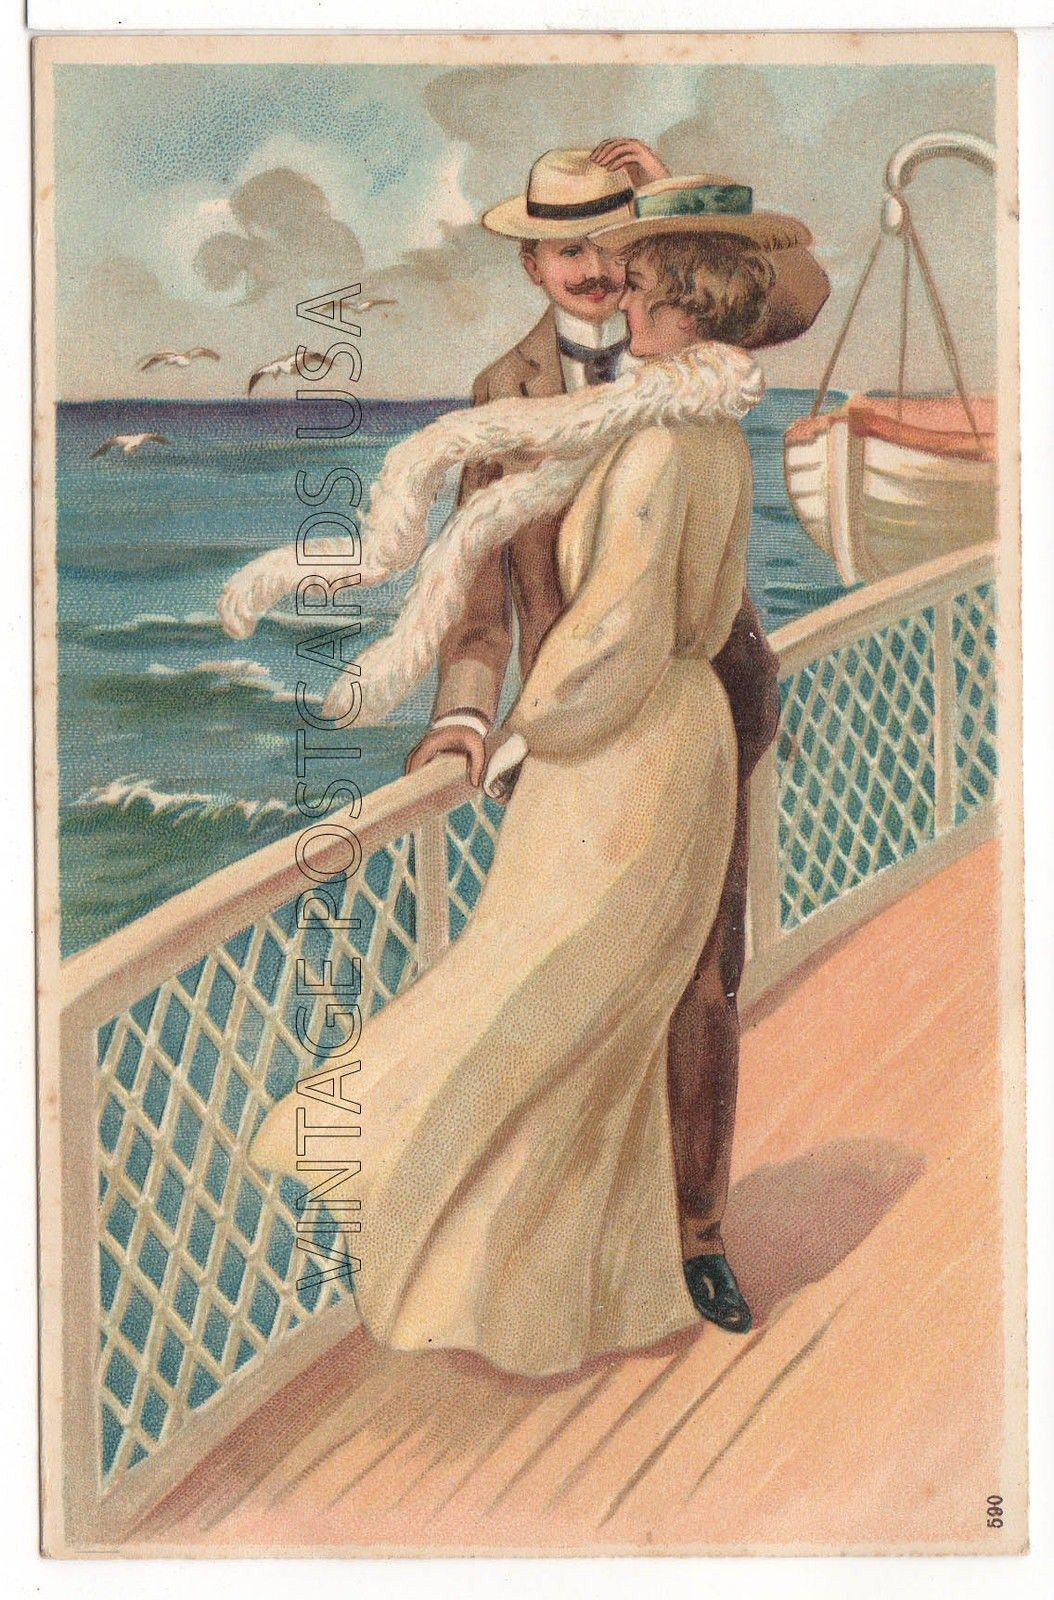 Gorgeous Couple On Board a Ship Vintage Postcard | eBay